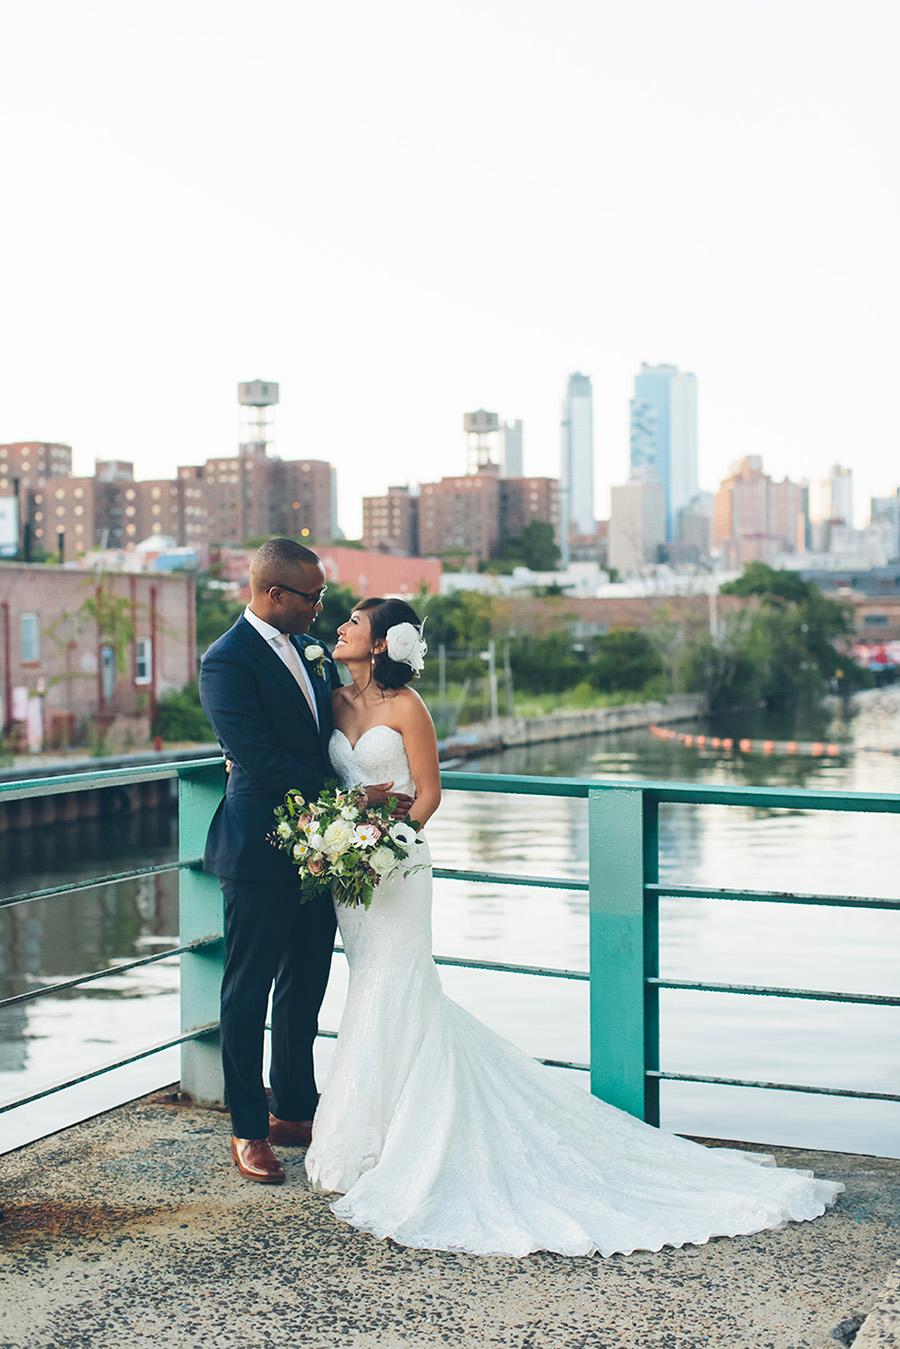 NYC-WEDDING-PHOTOGRAPHER-CITYHALL-ELOPEMENT-501-UNION-BROOKLYN-WEDDING-JILL-JUSTIN0008.jpg